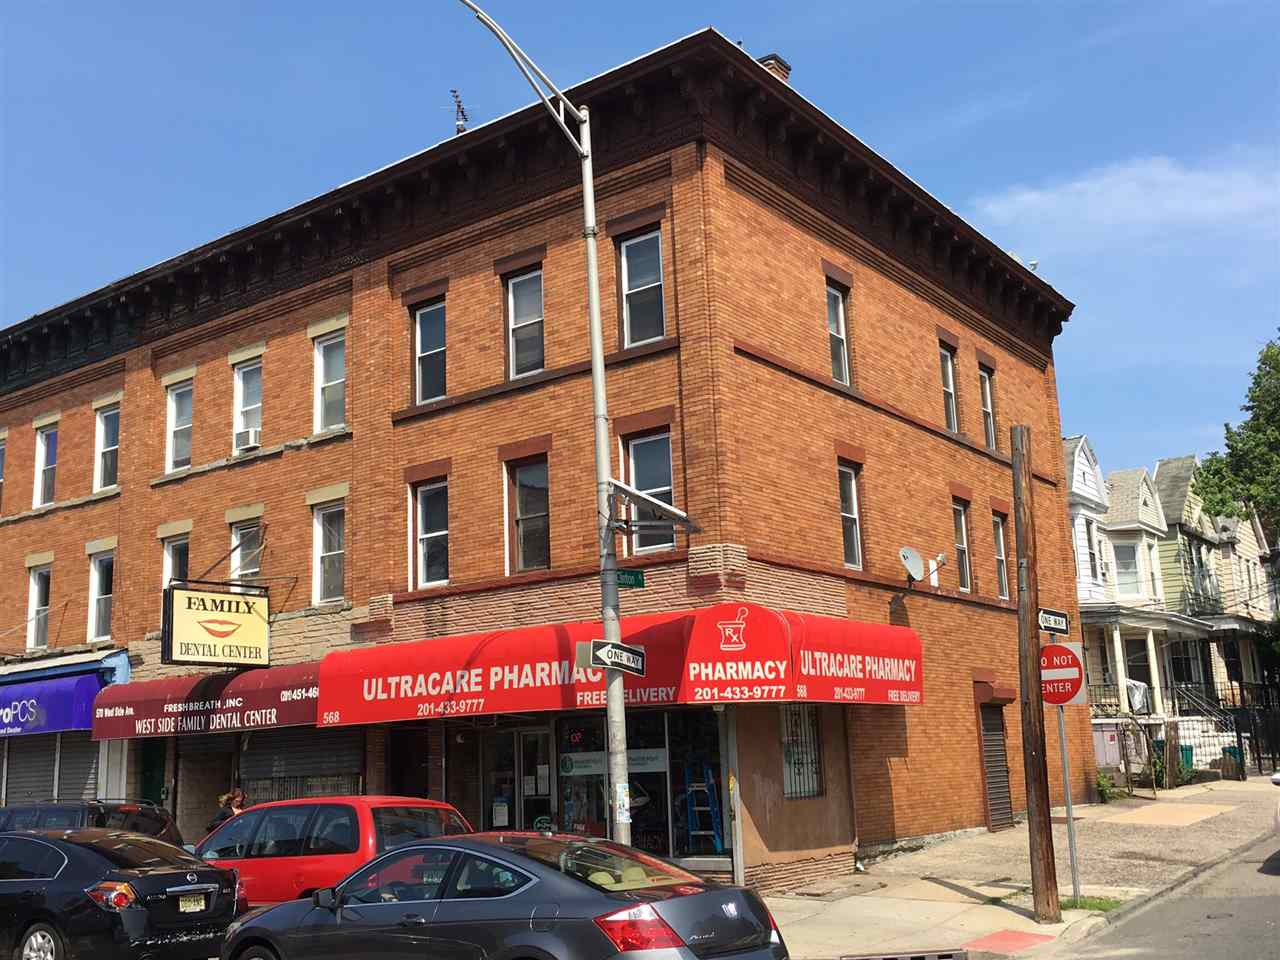 568 WEST SIDE AVE, JC, Journal Square, NJ 07304